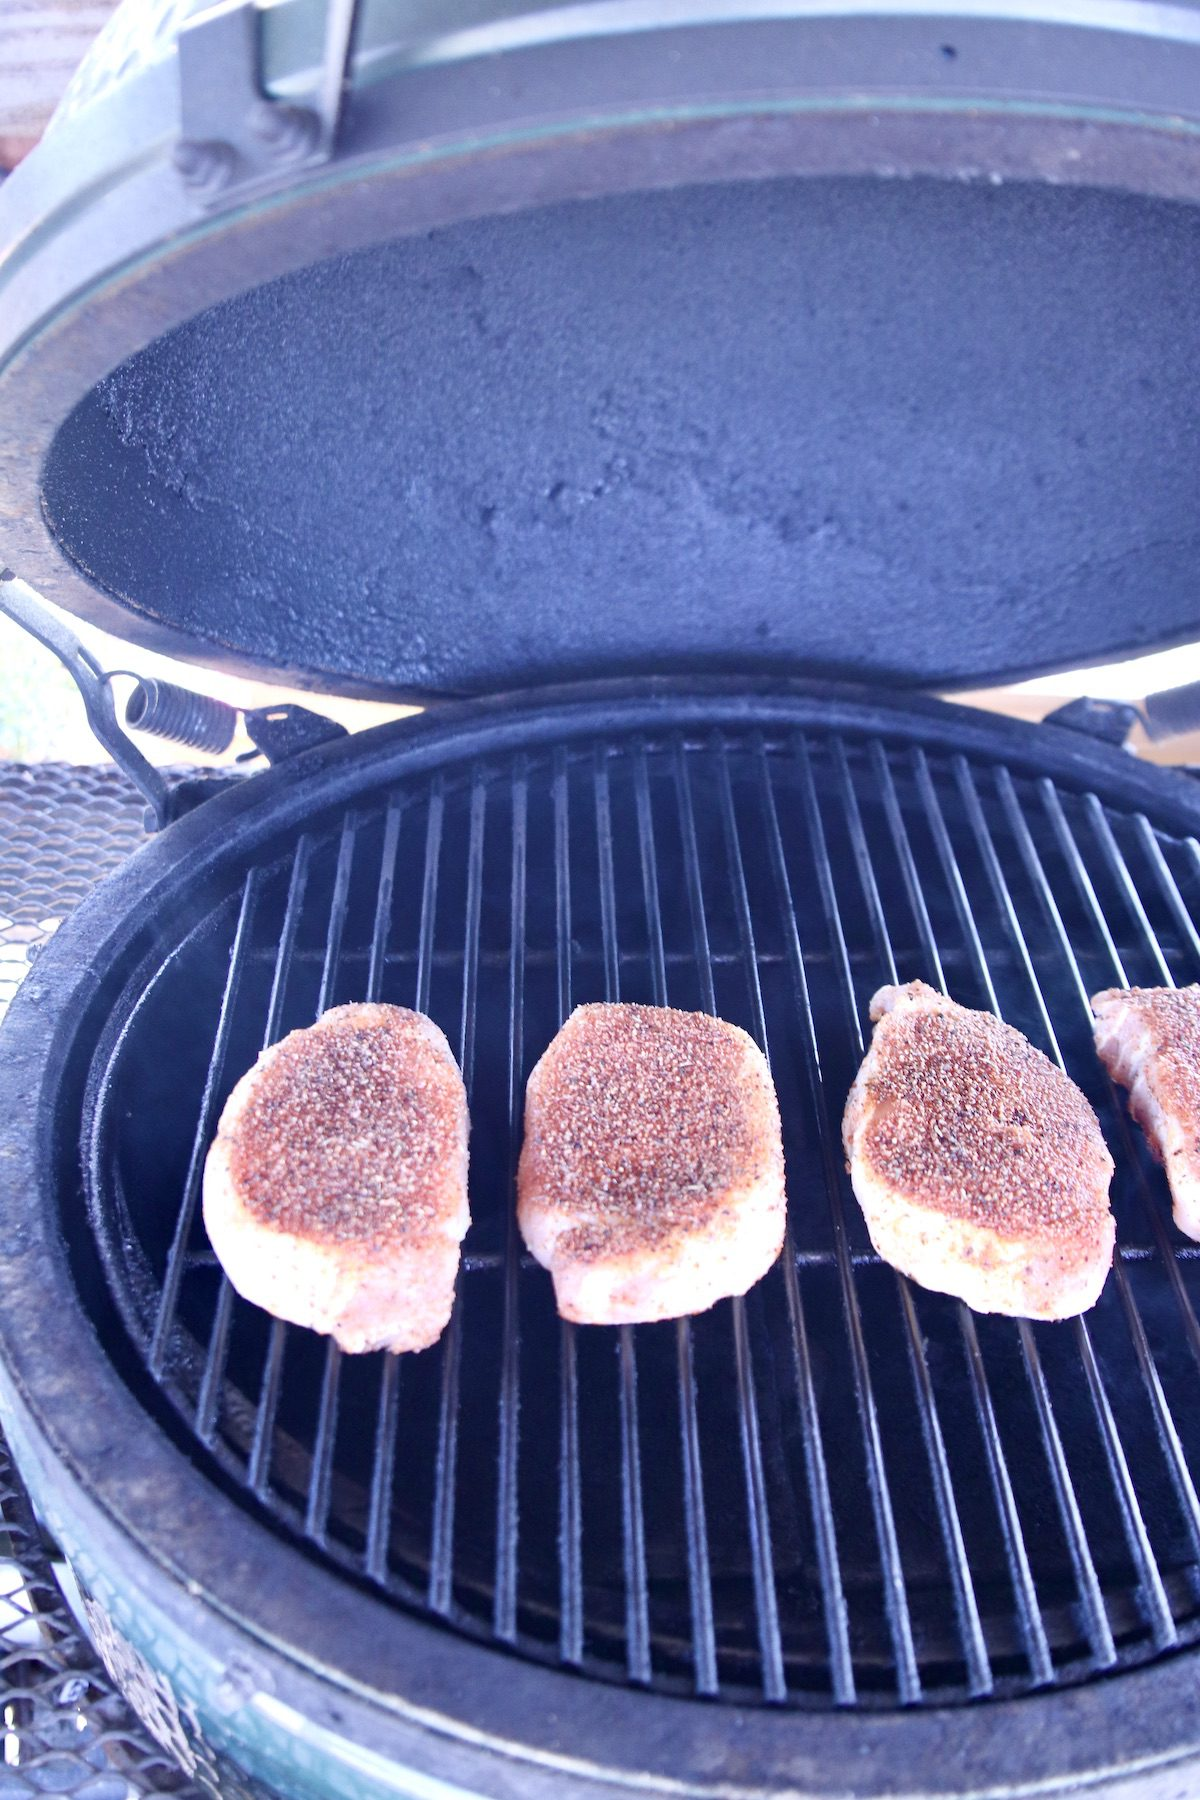 Grilling 4 boneless pork chops